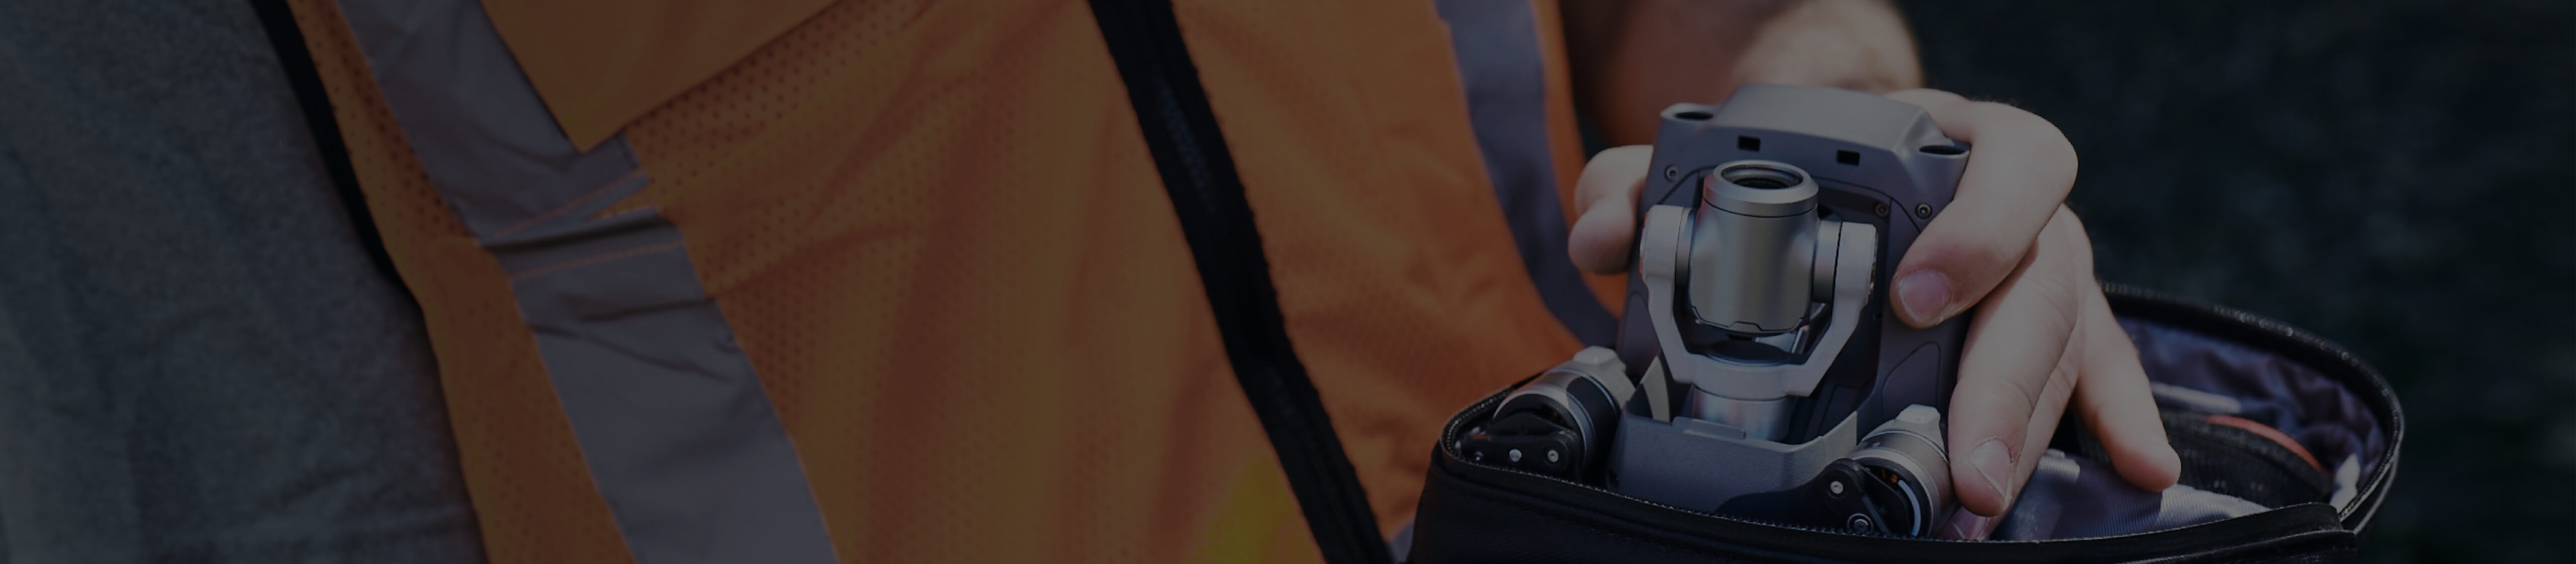 mavic2-enterprise-dual-imagen